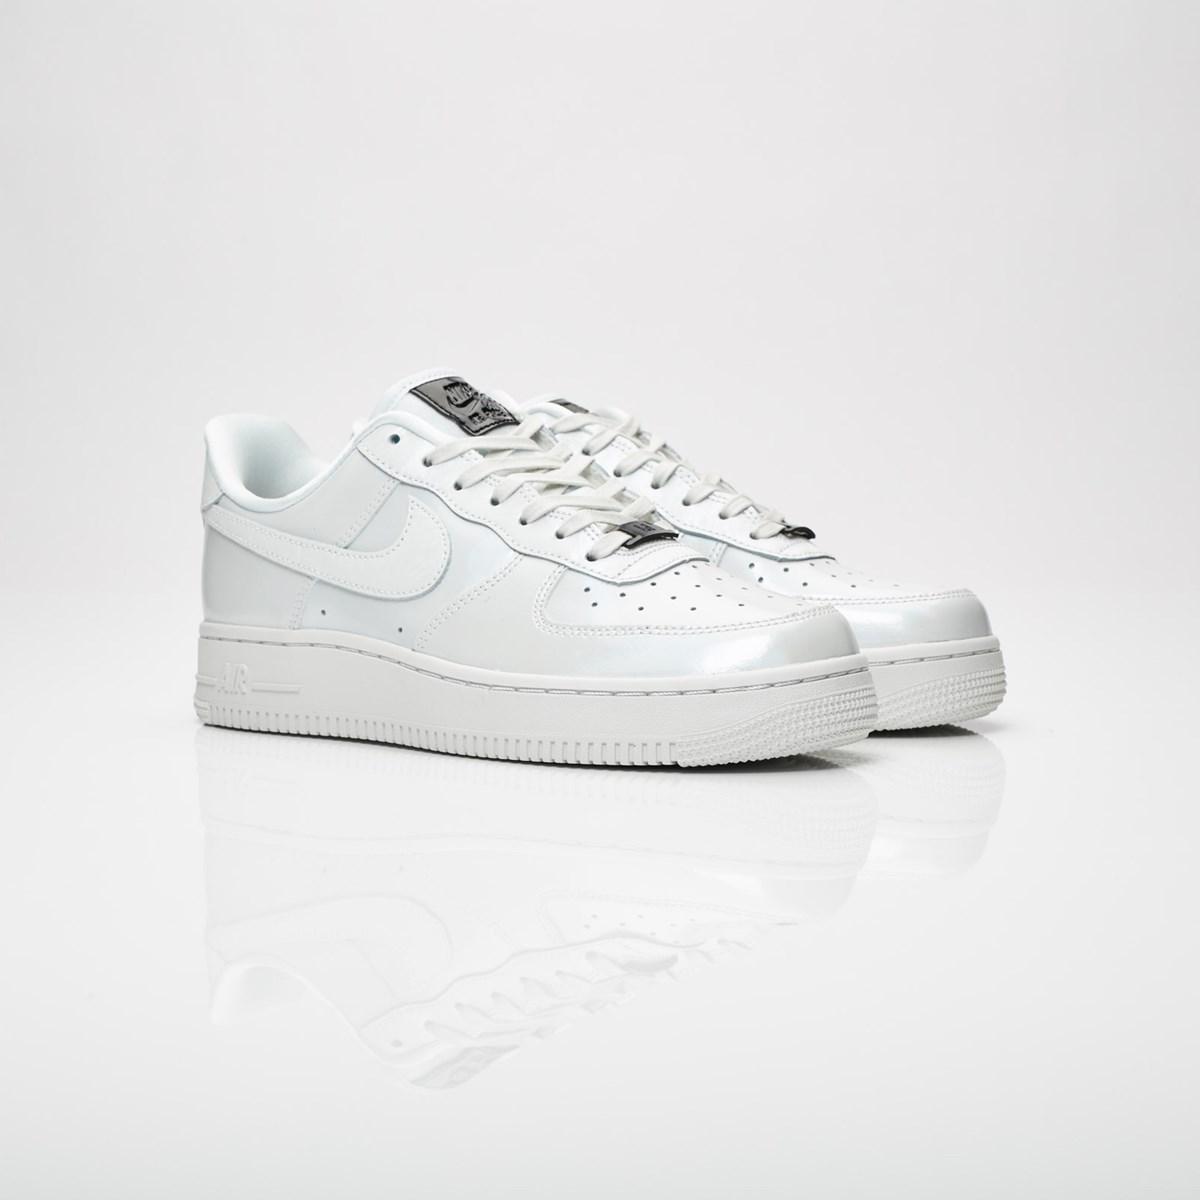 uk availability 92326 4d53e nike wmns air force 1 ´07 lx 898889 100 sneakers   streetwear på nätet sen  199